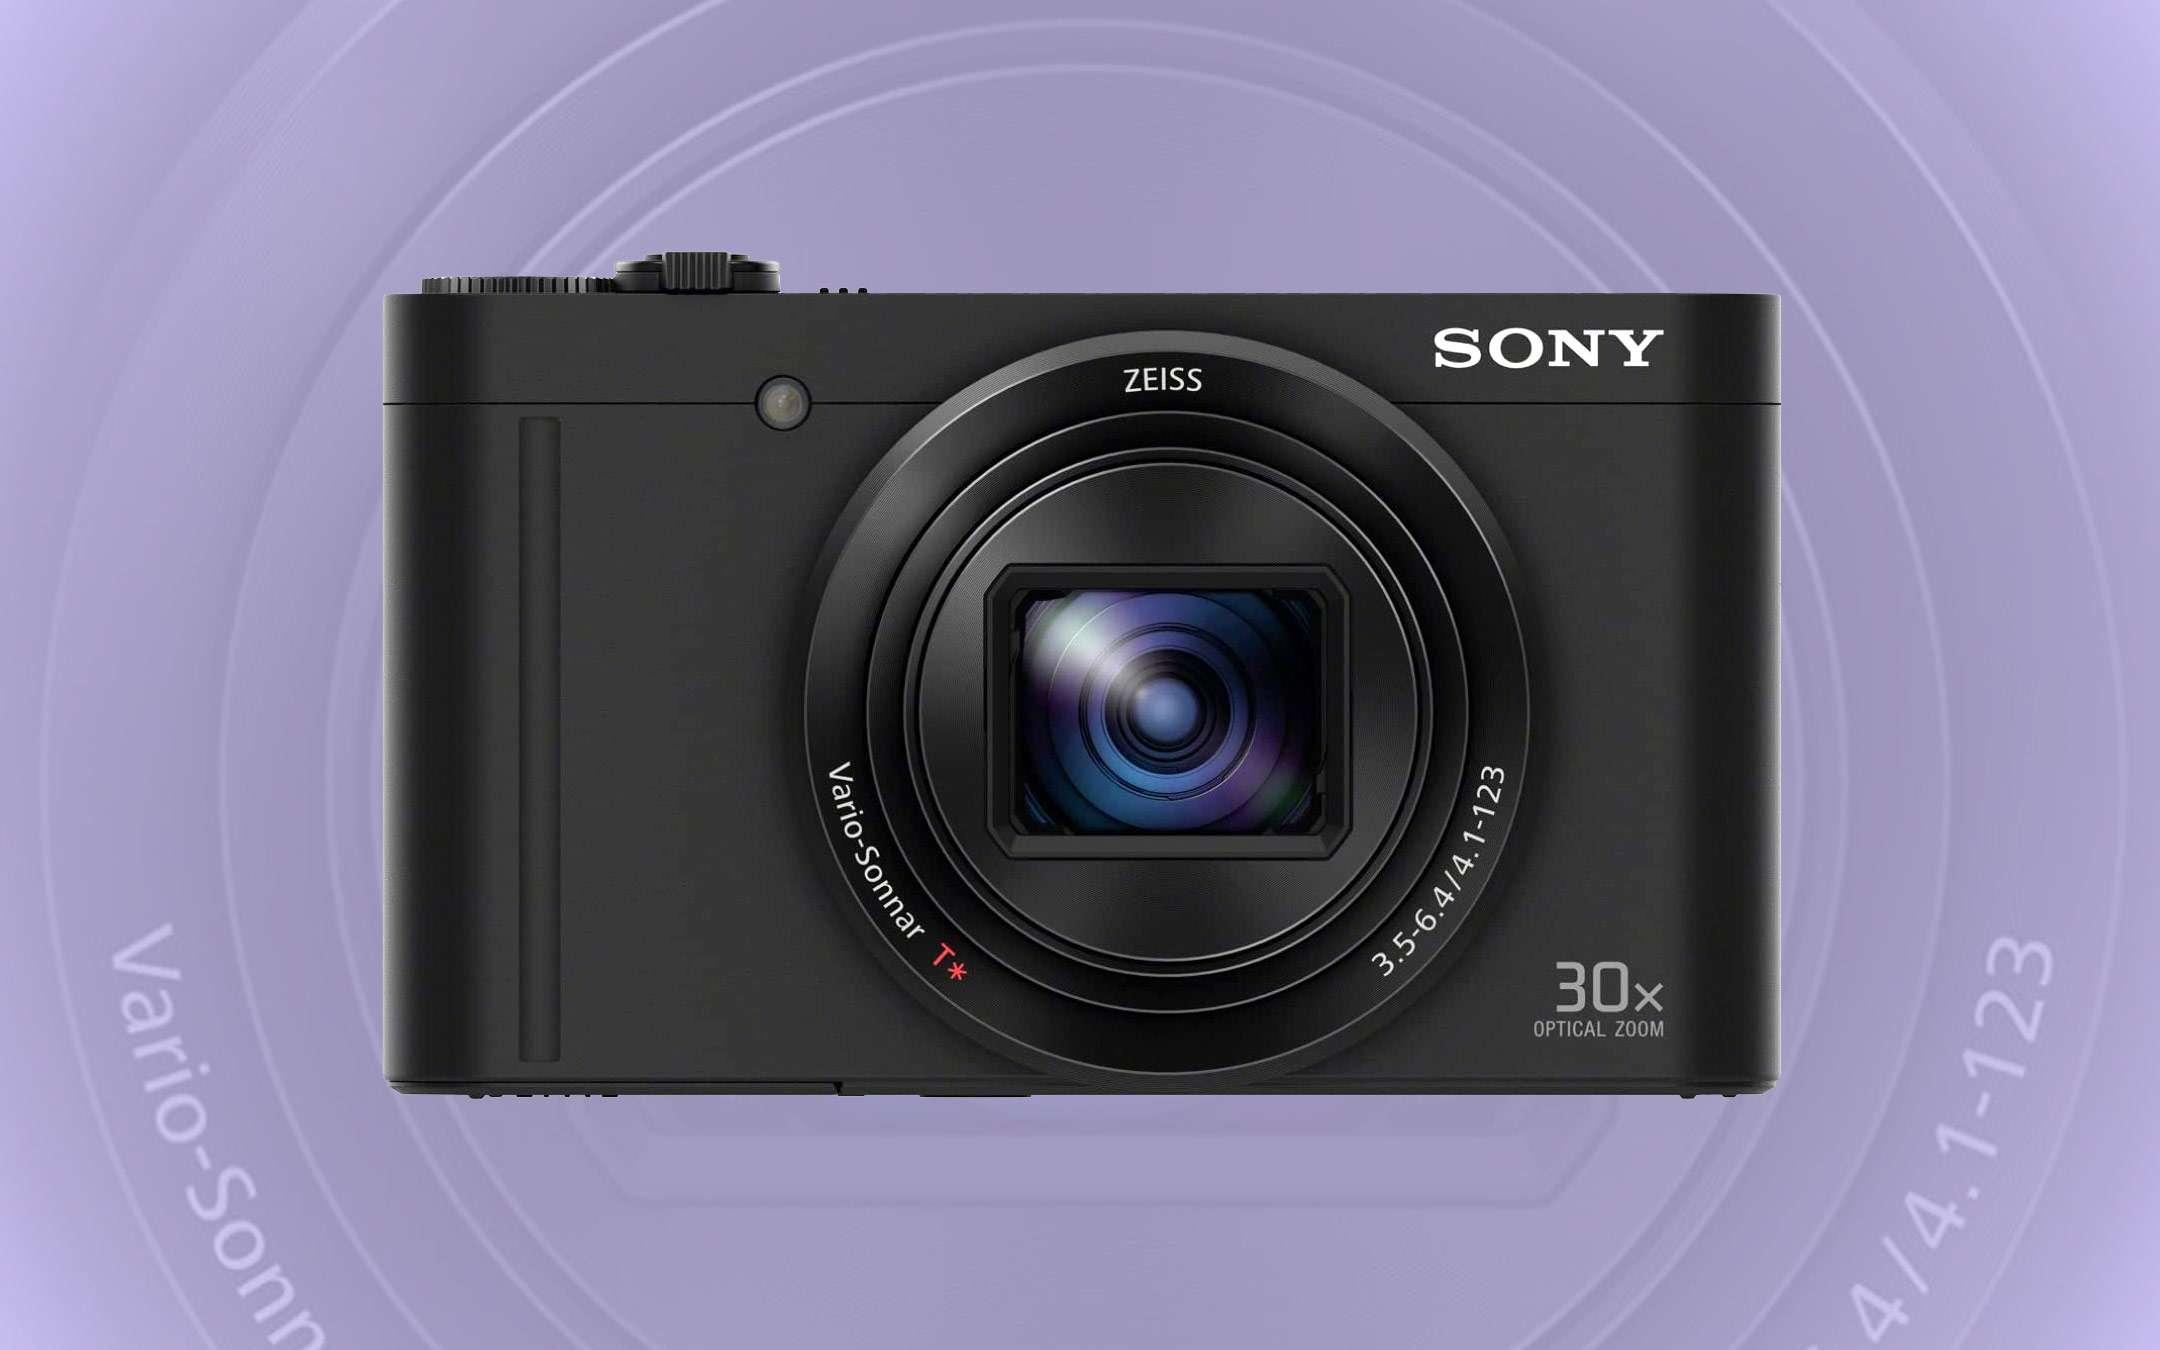 Prime Day: fotocamera Sony DSC-WX500, sconto FLASH